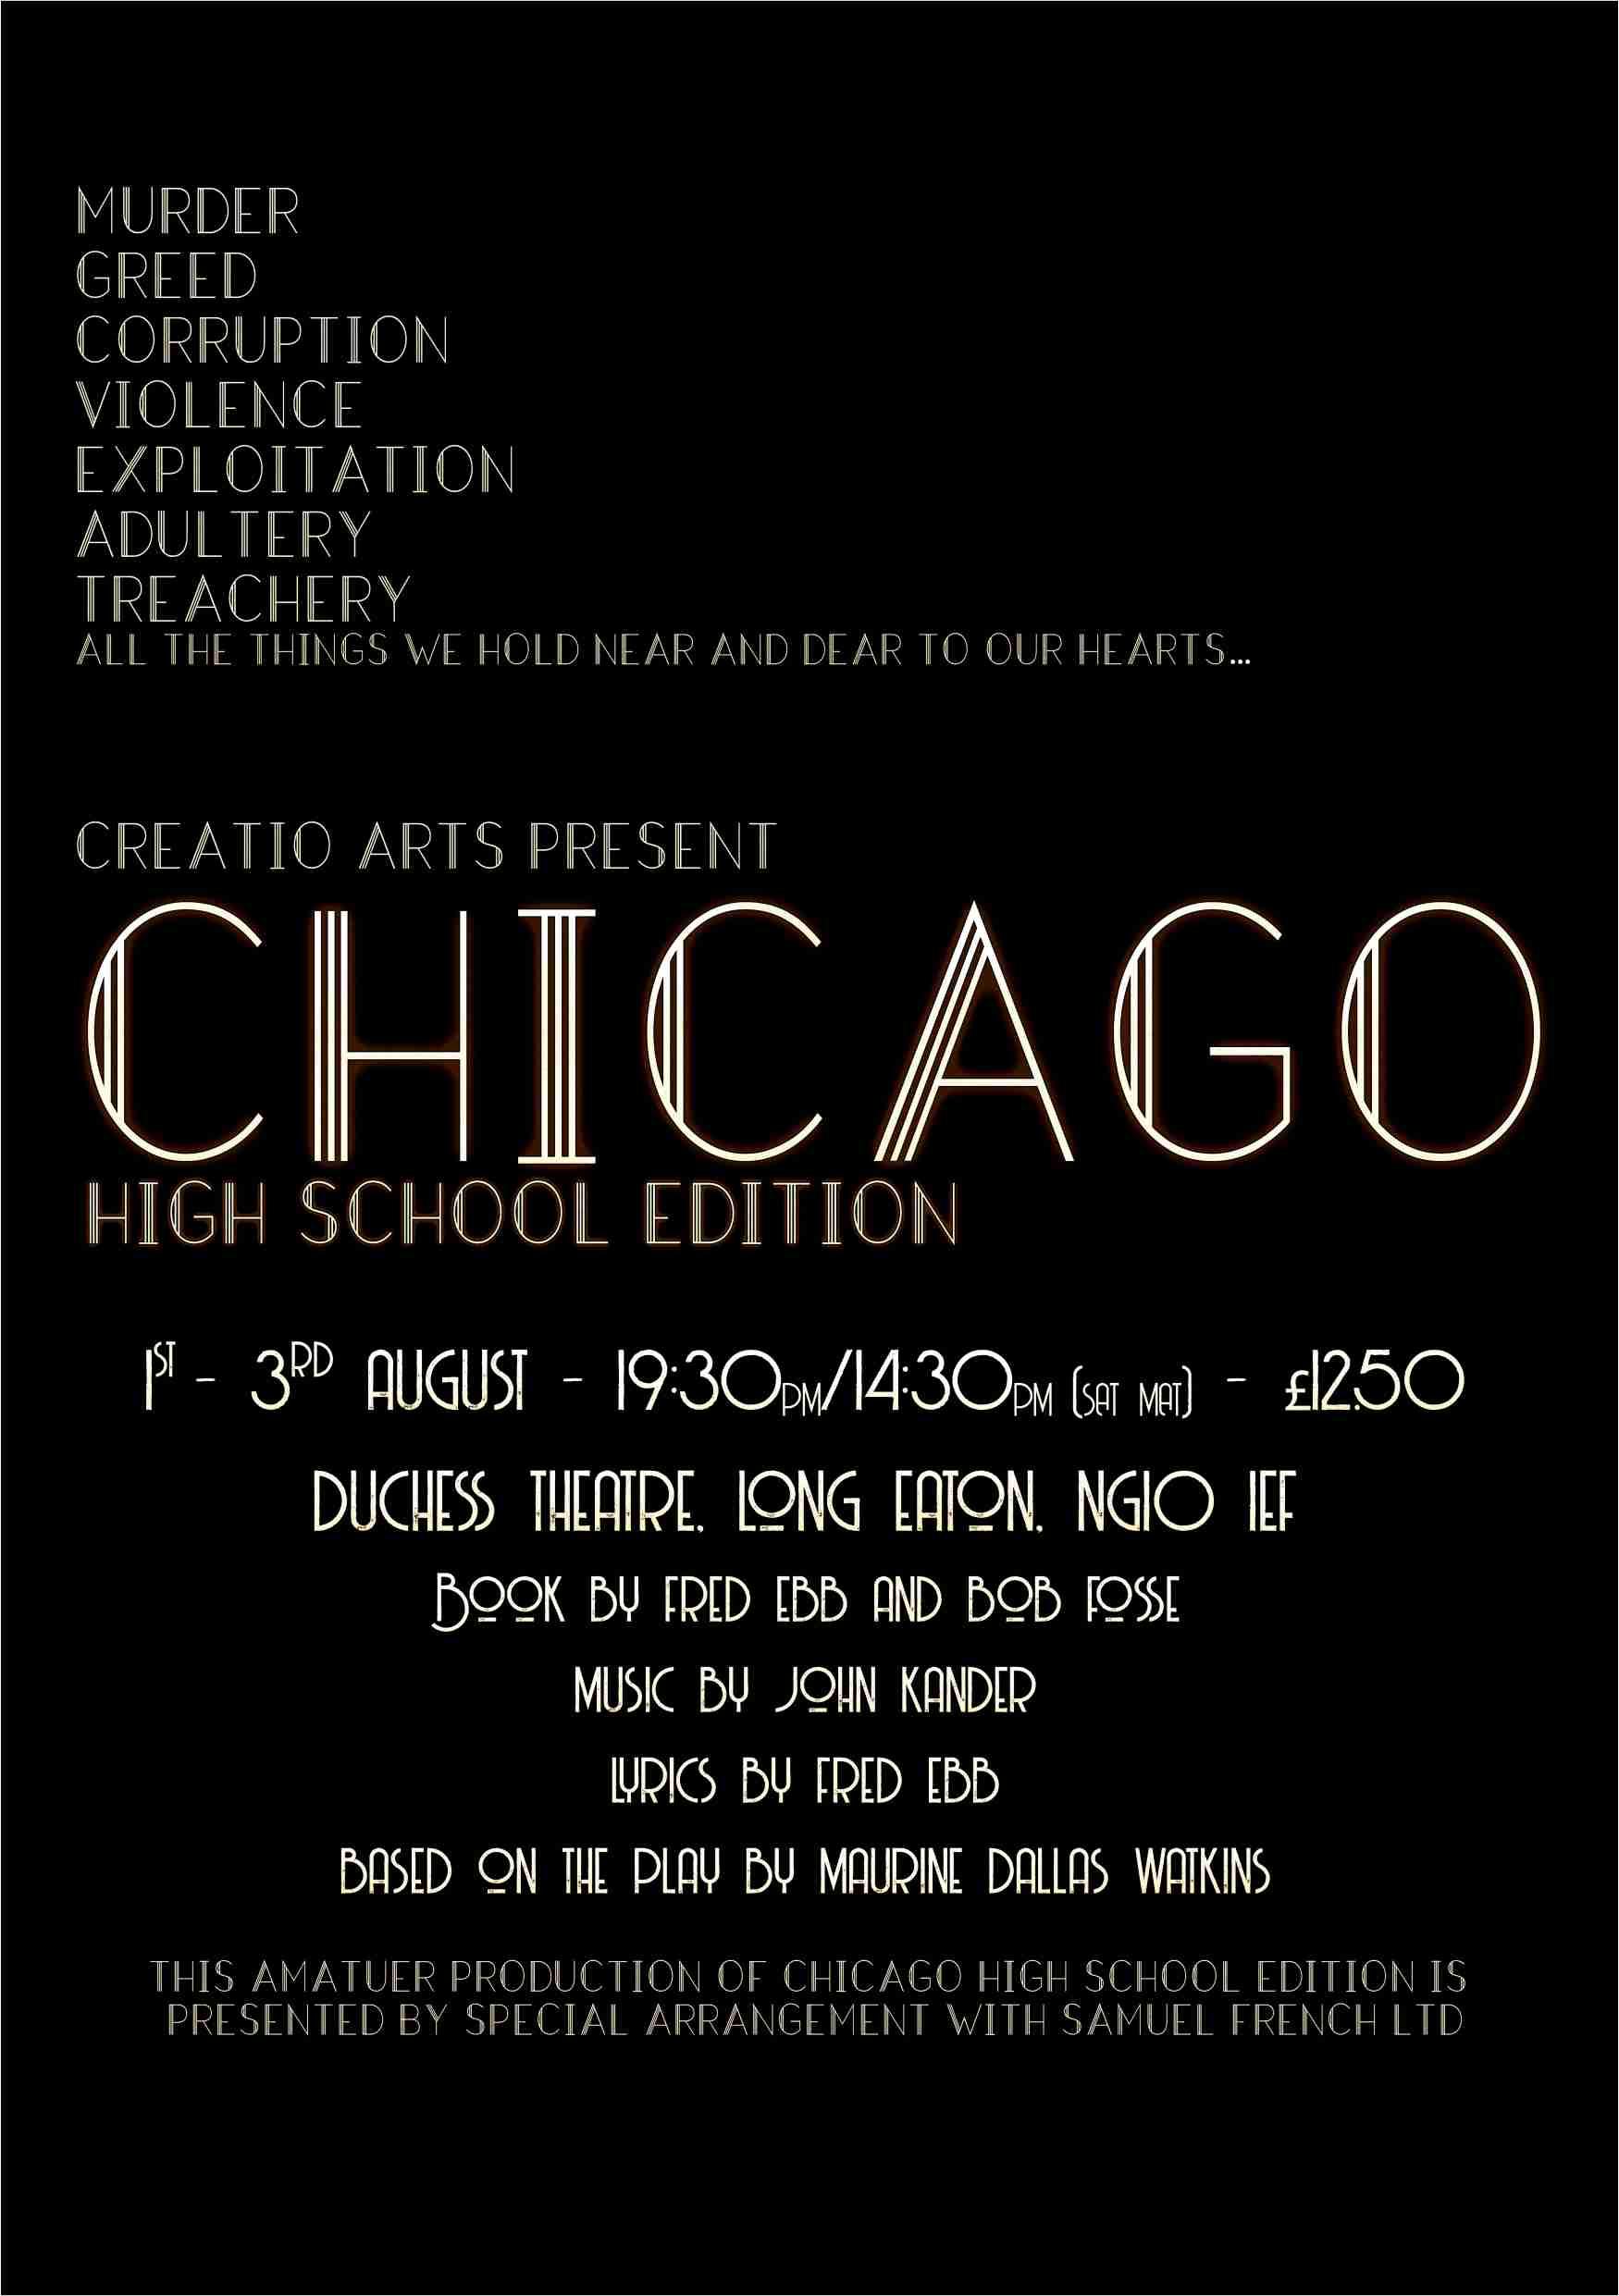 CHICAGO High School Edition - Creatio Arts banner image